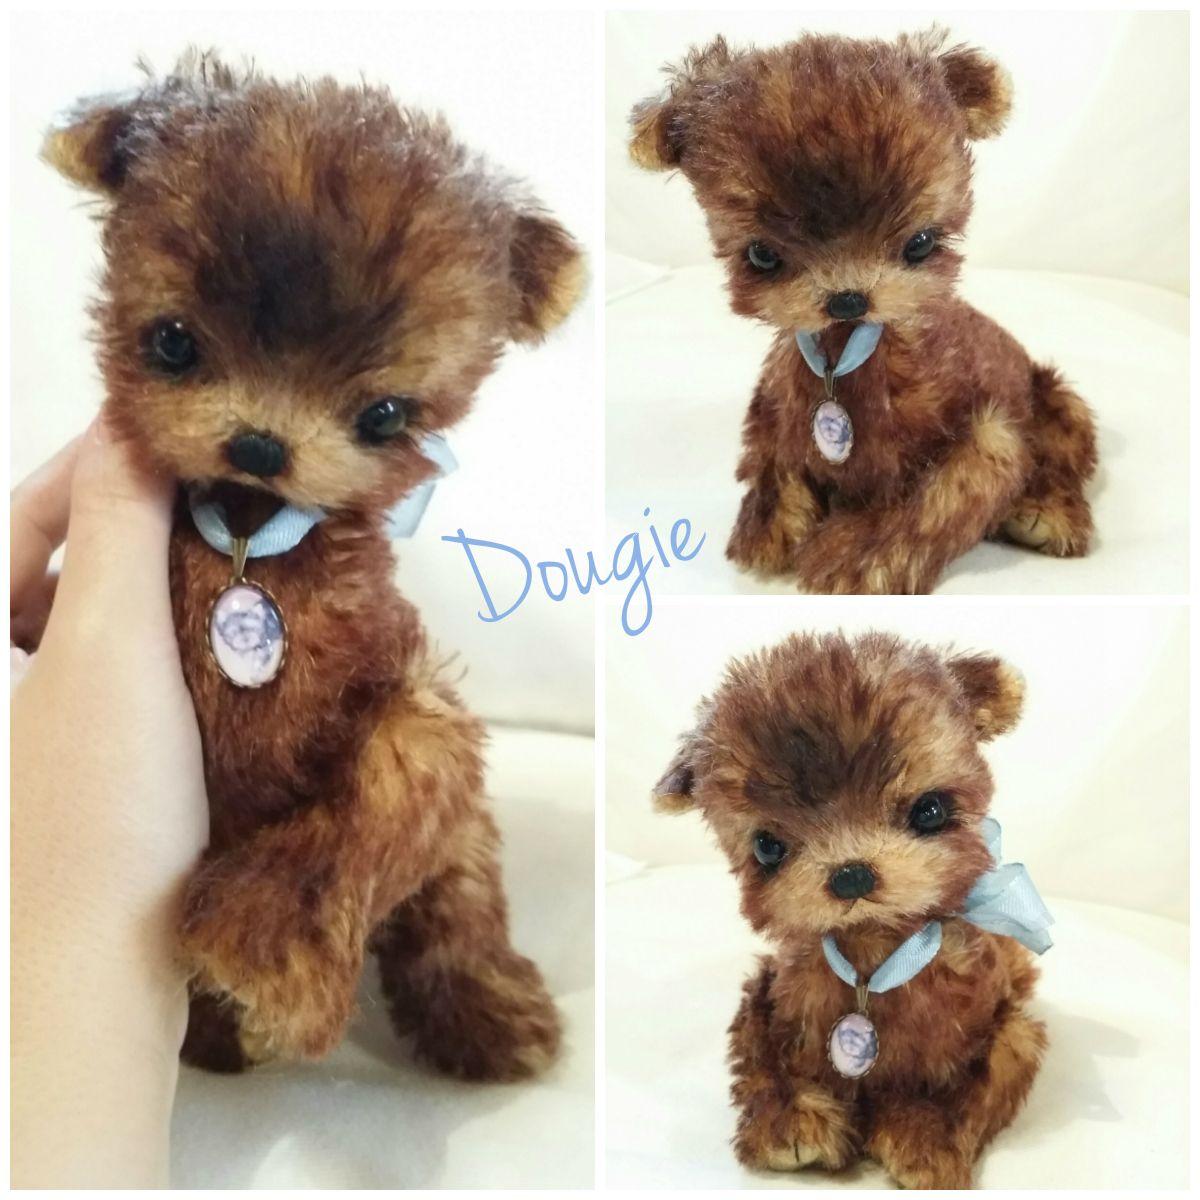 Yorkshire Terrier Baby ♡ Dougie ♡ Www.Teddy-Manufaktur.de Huhuuu ...